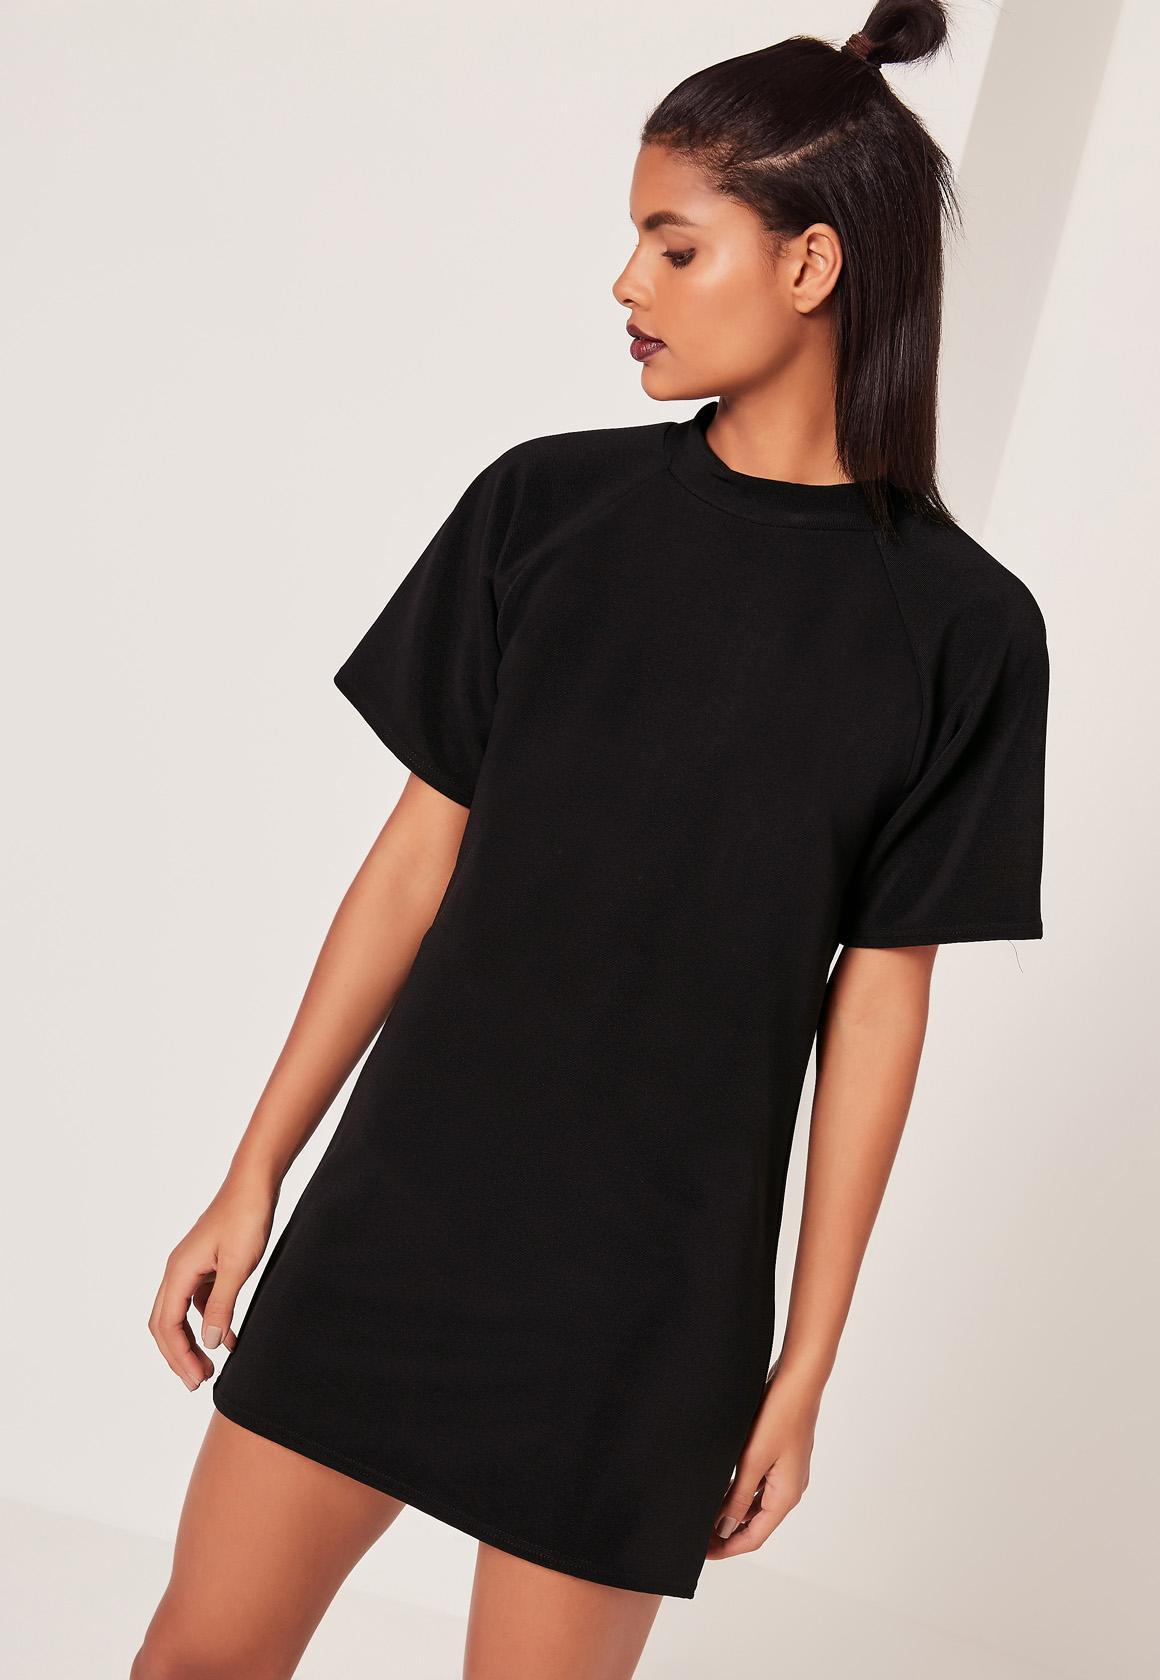 t shirt dress short sleeve oversized t-shirt dress black iwjdhob